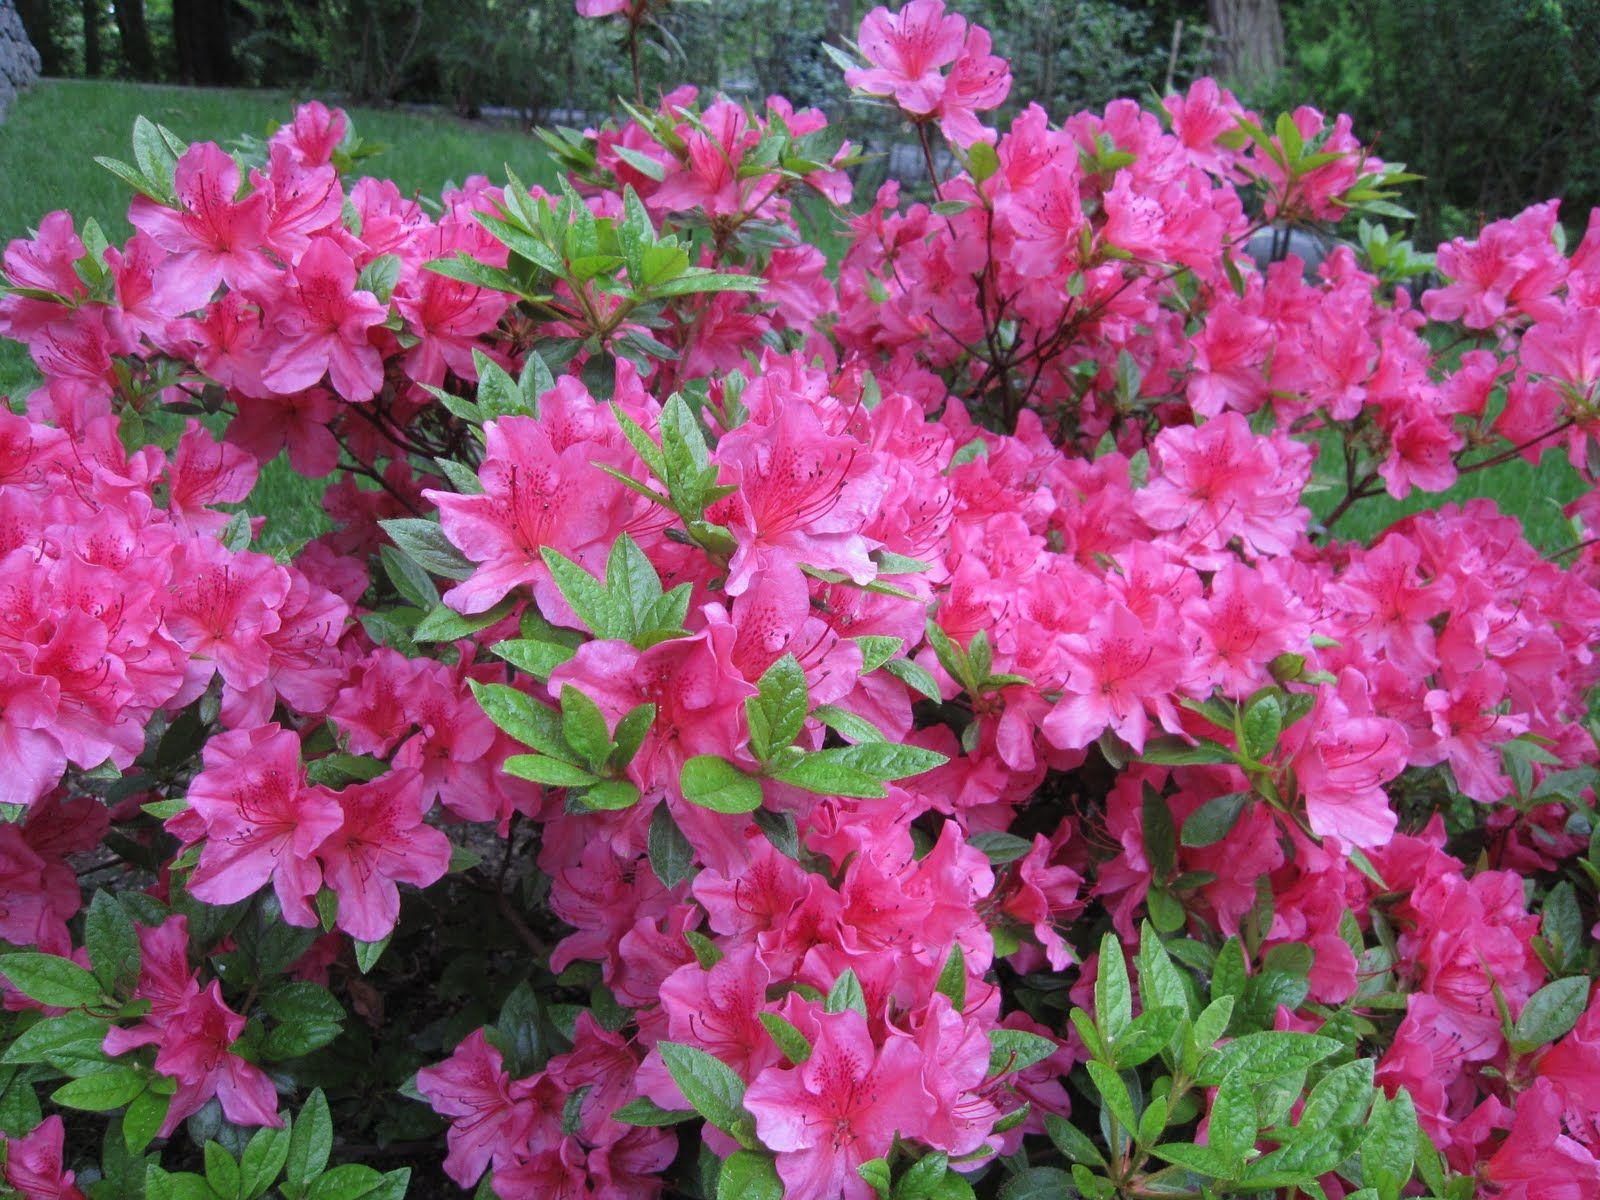 How to care for an azalea bush indoors garden pinterest azalea pictures of best flowering shrubs bushes types of plant mightylinksfo Images